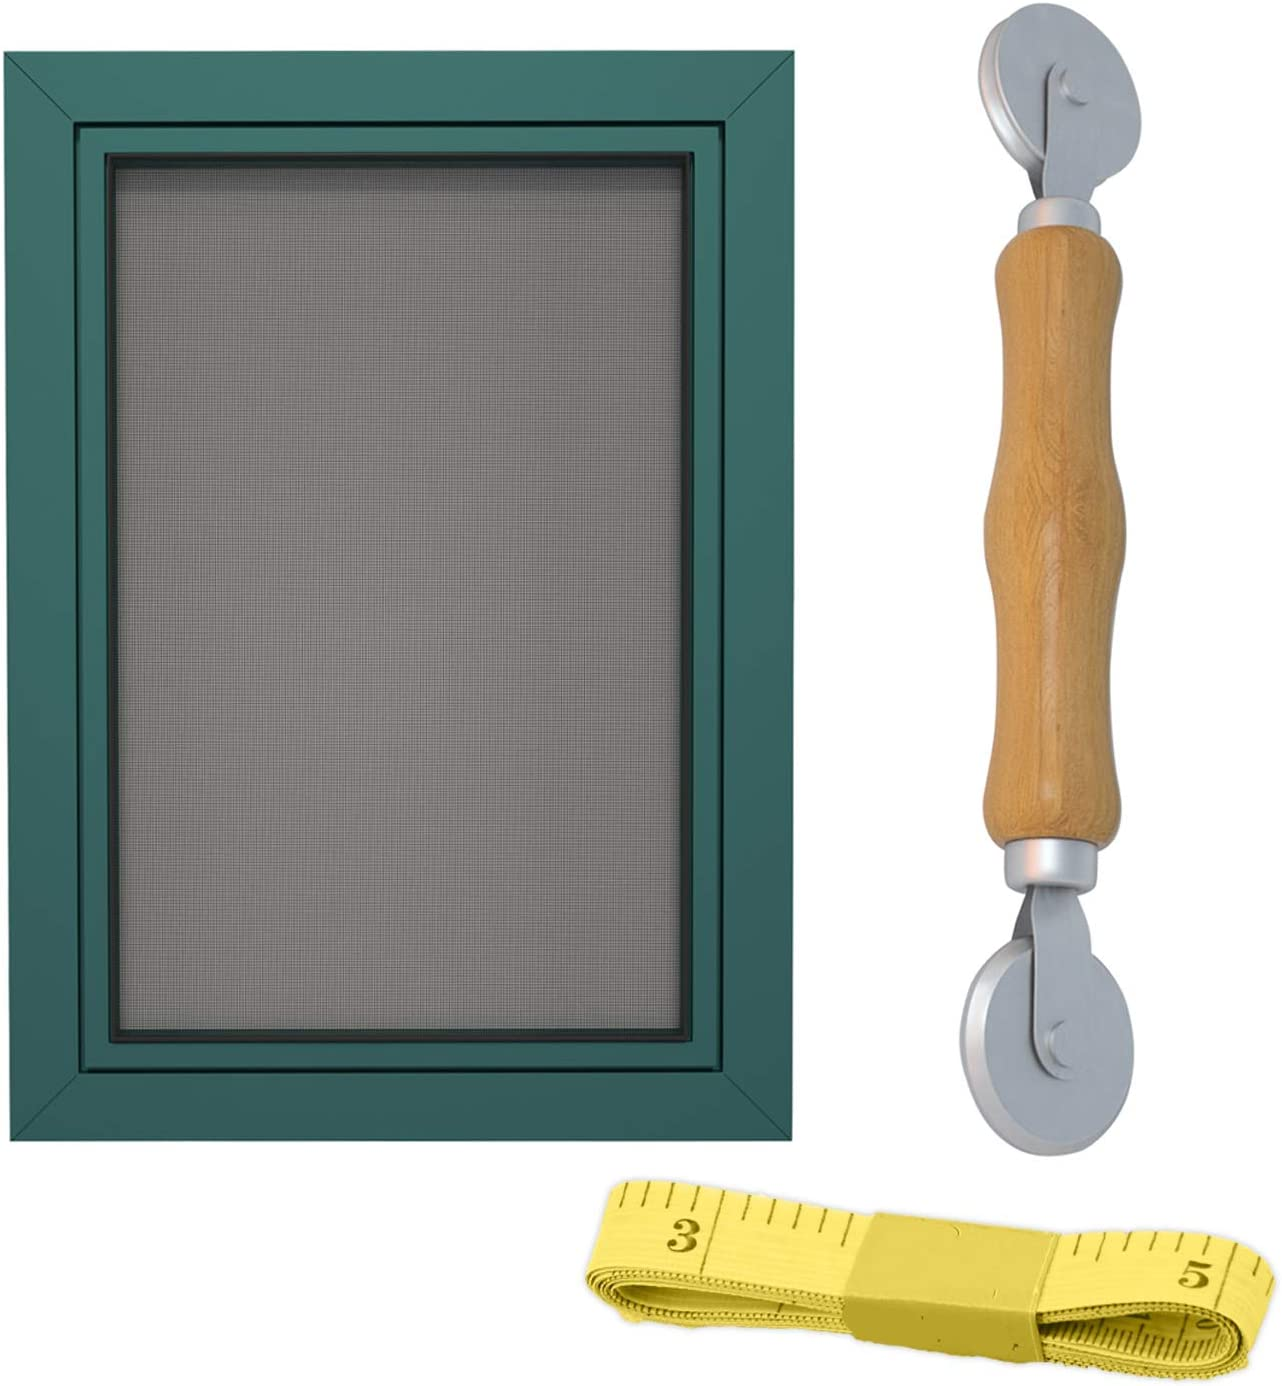 Adjustable DIY Window Screen Fiberglass Mesh Screen Replacement Kit Door Screen Insect Screen Size Up to 59x 118 Max Black